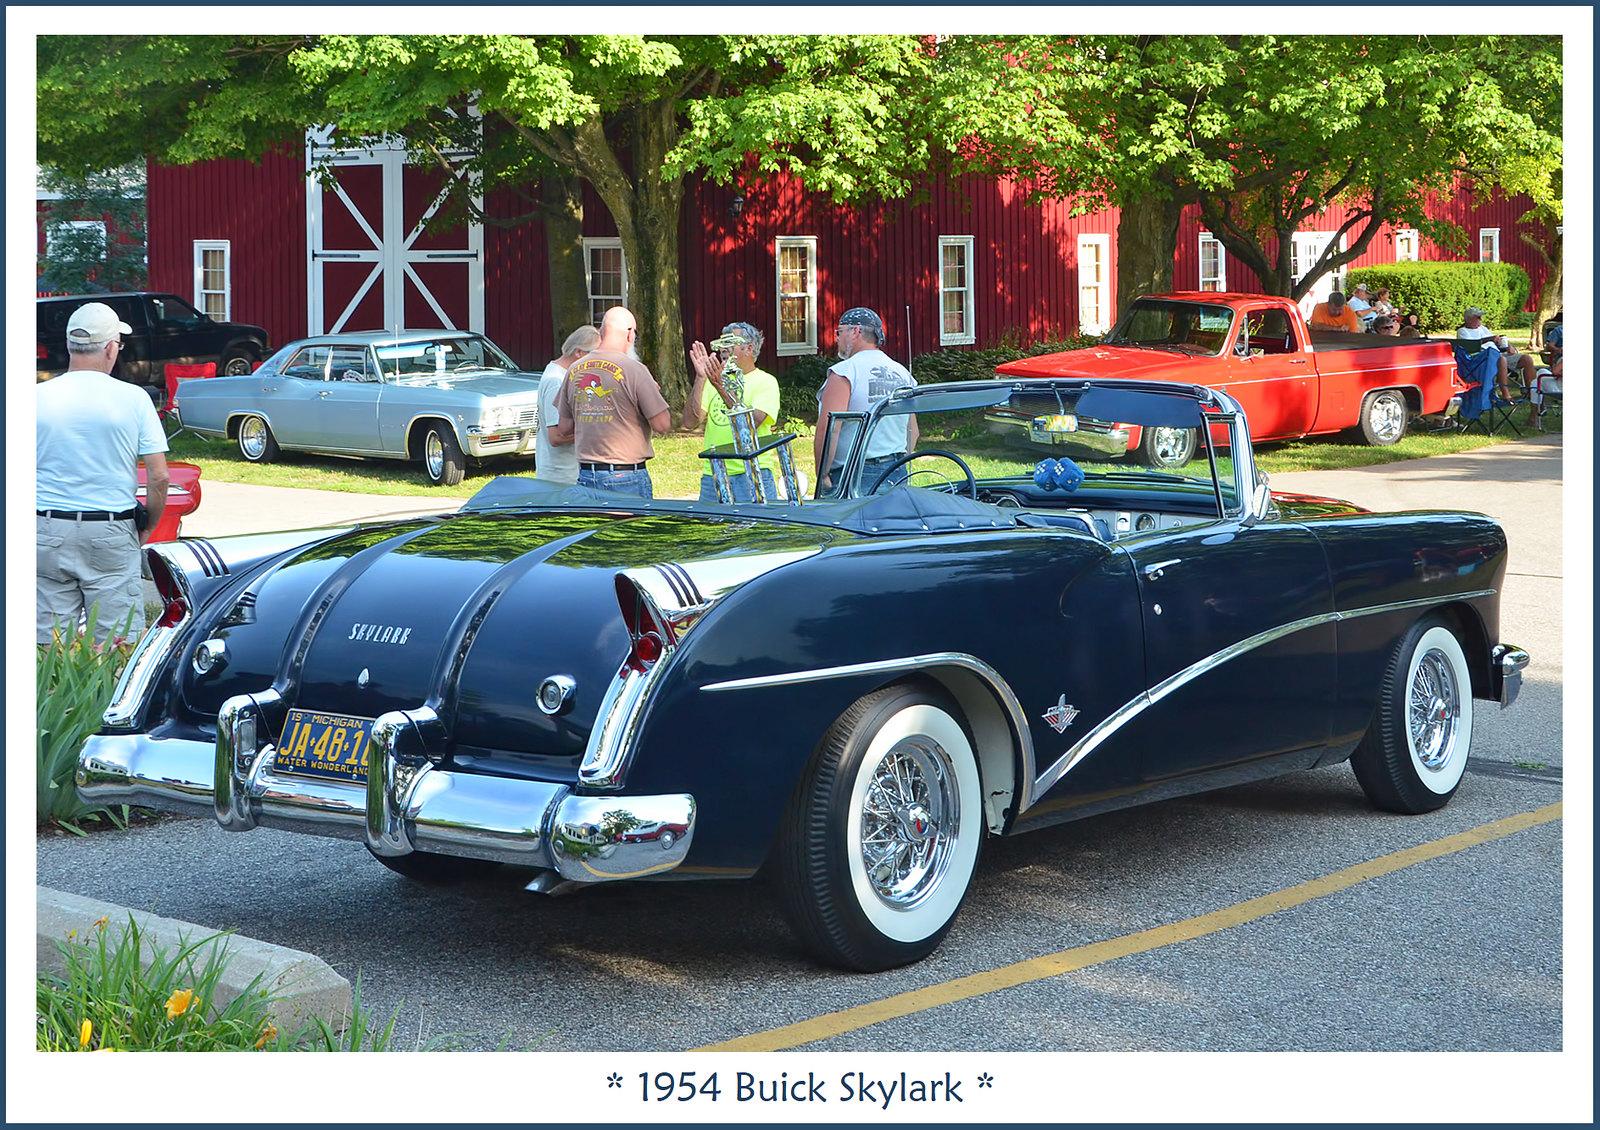 American Cars 1954 1955 Flickr Buick Riviera Convertible